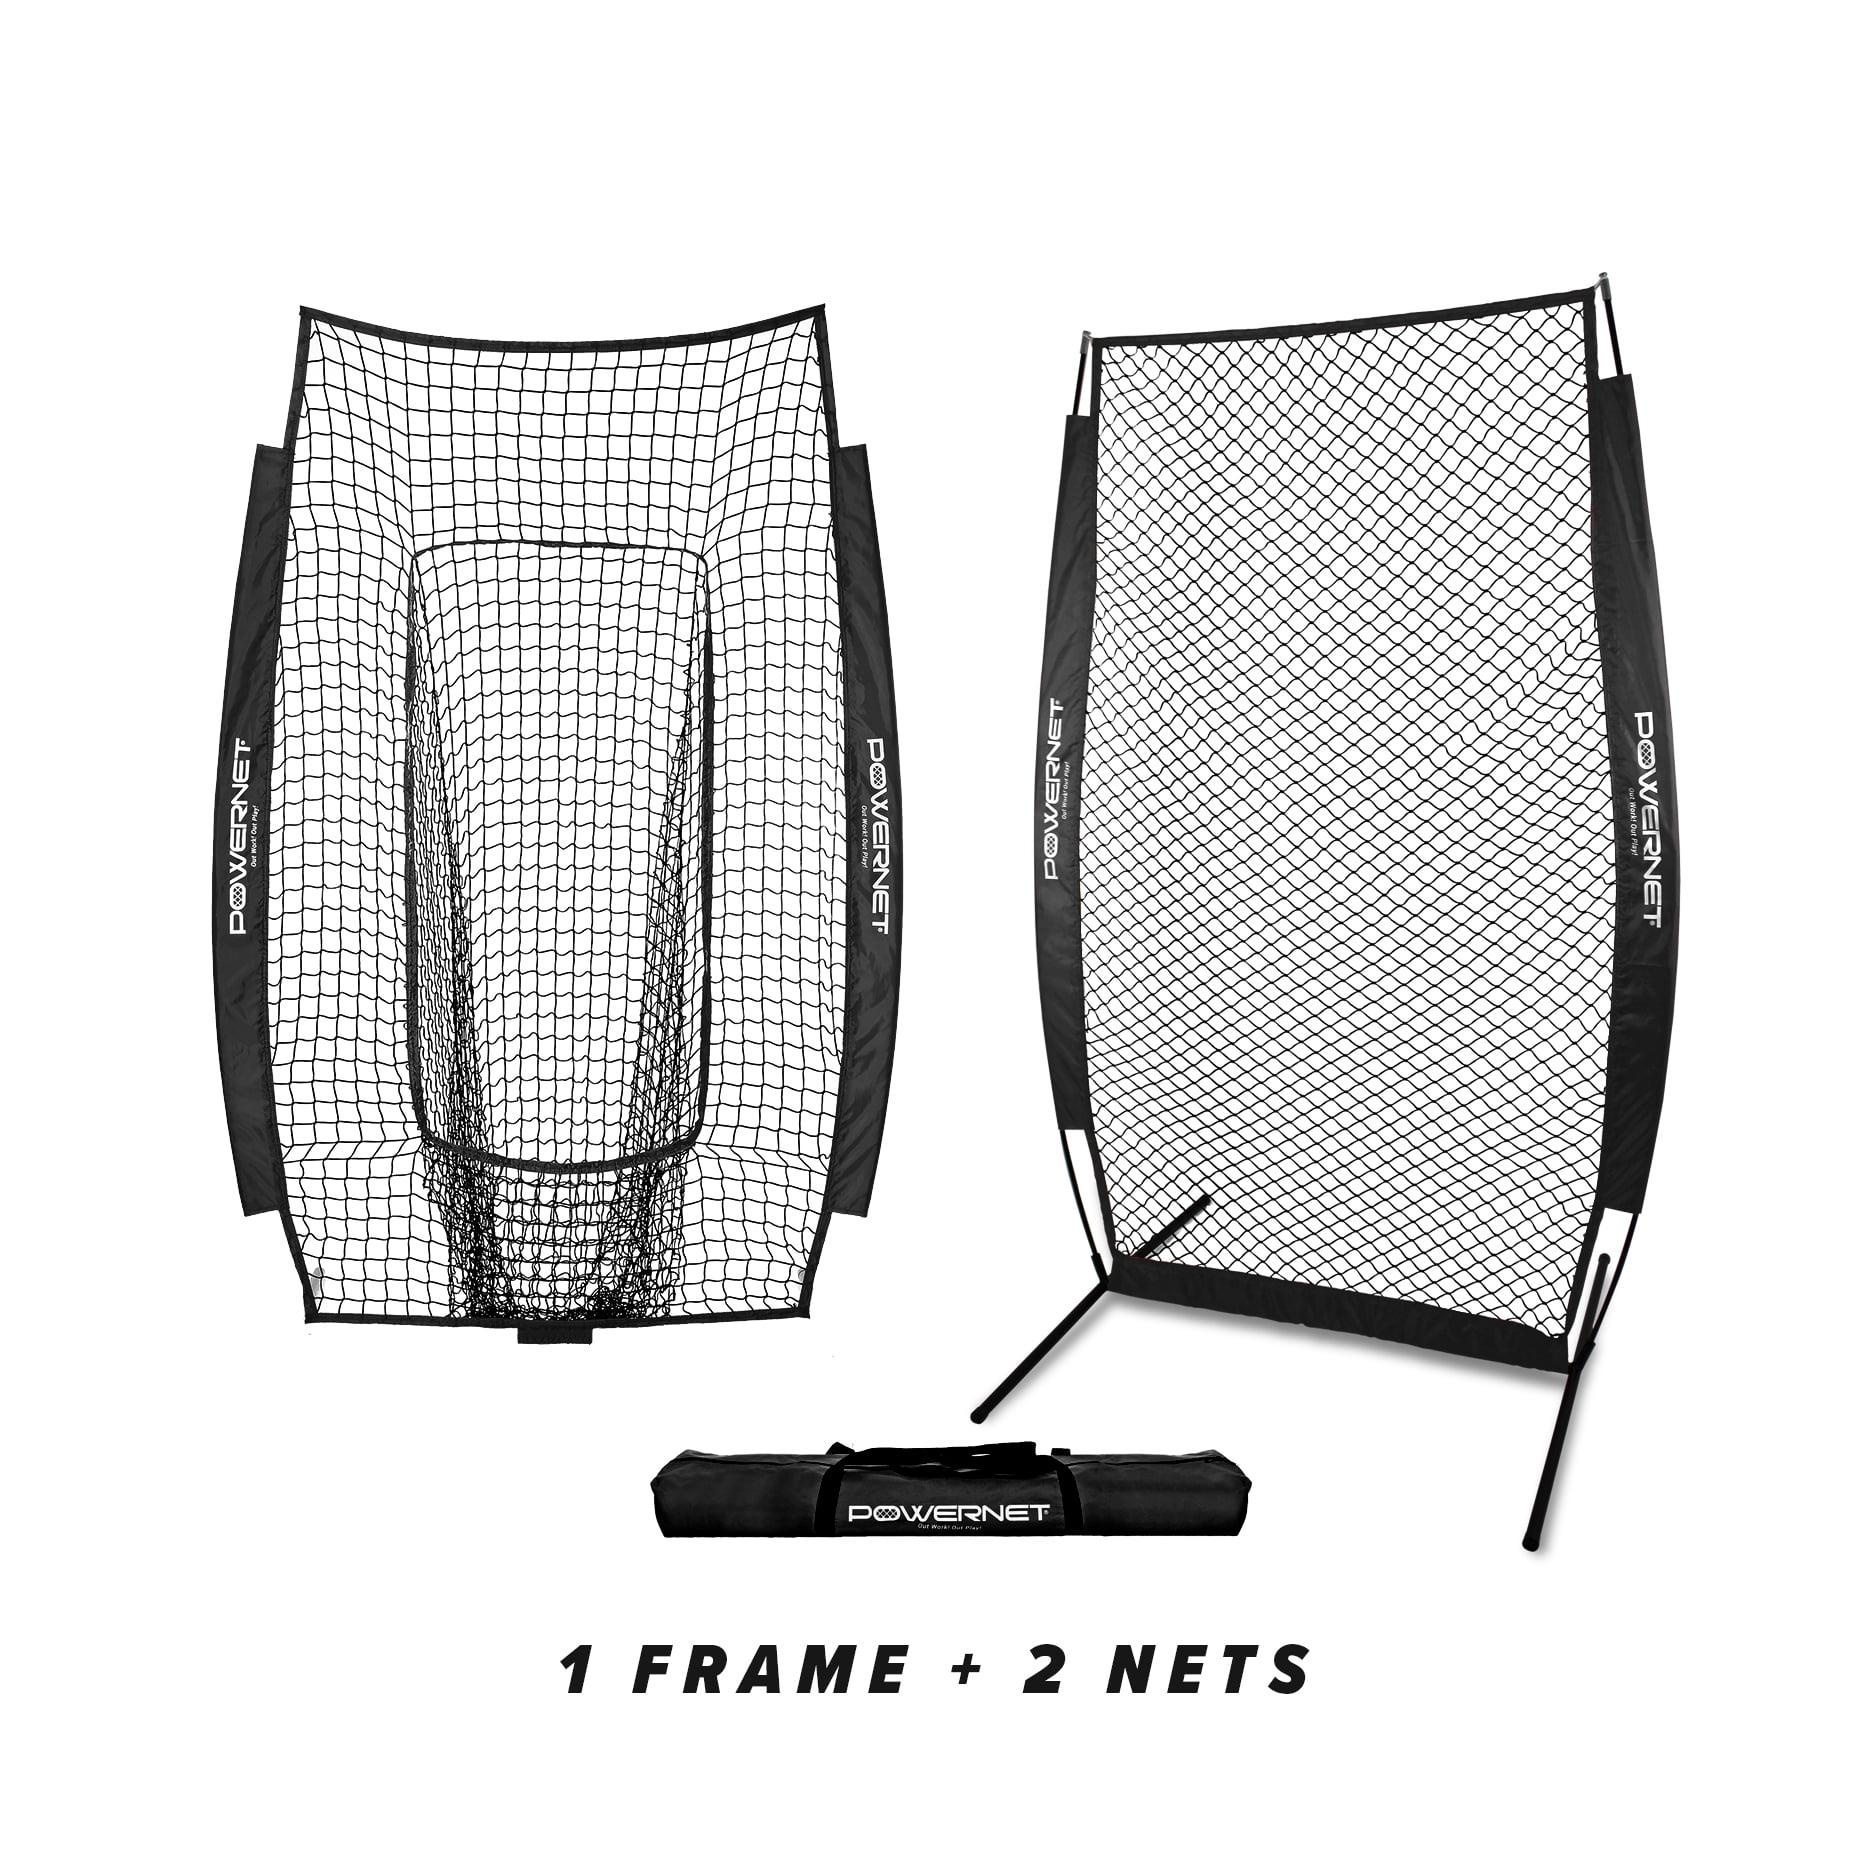 powernet i-screen w/ frame + infielder net bundle